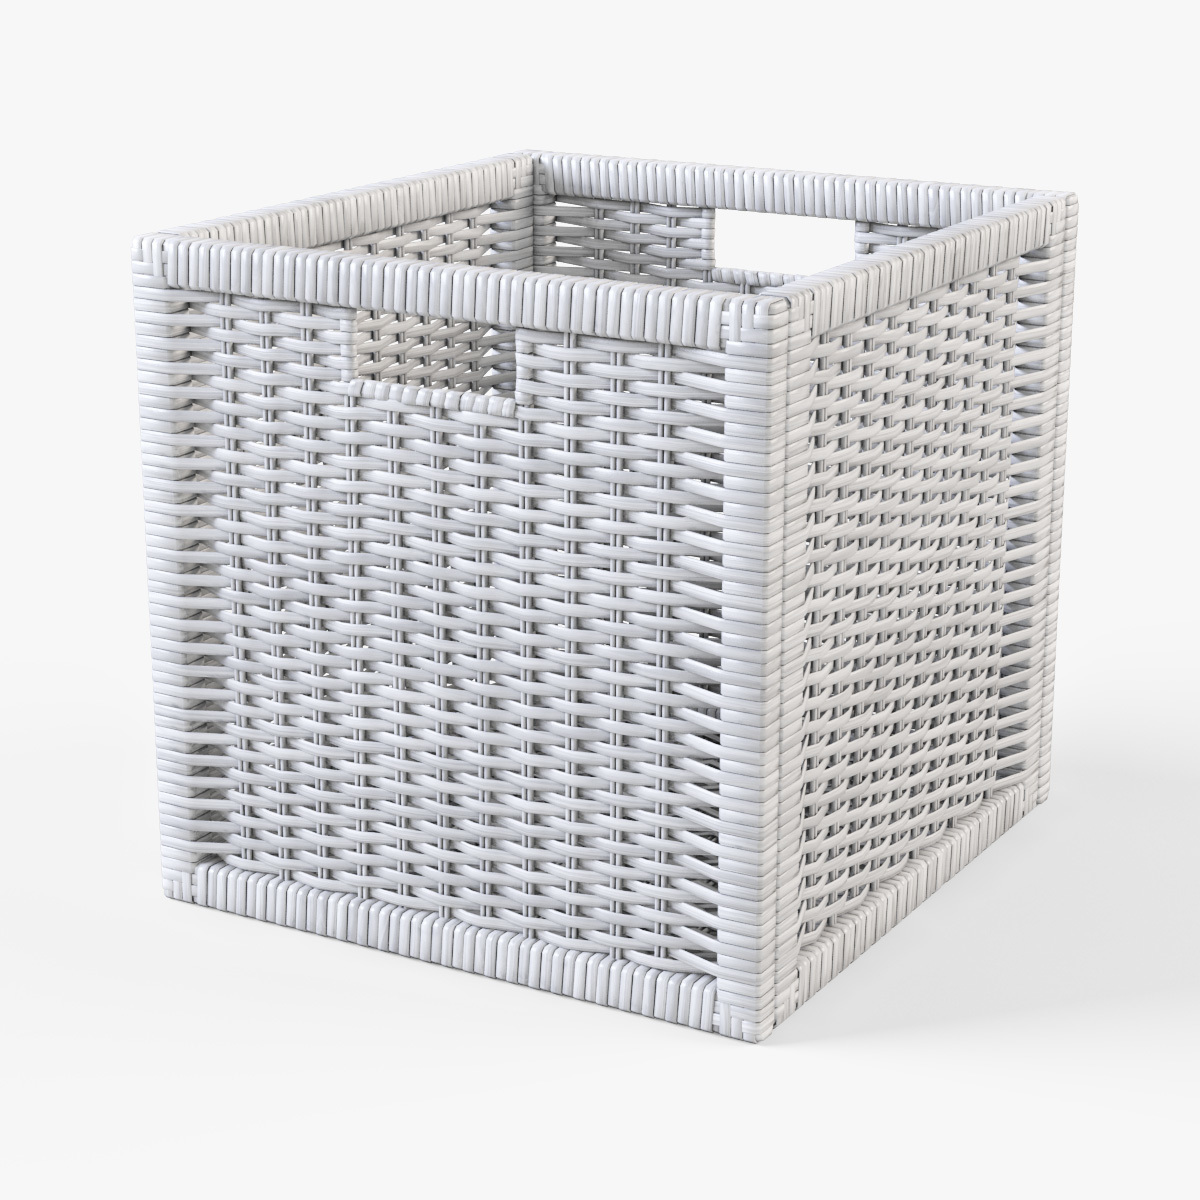 rattan basket ikea branas white color by markelos 3docean. Black Bedroom Furniture Sets. Home Design Ideas